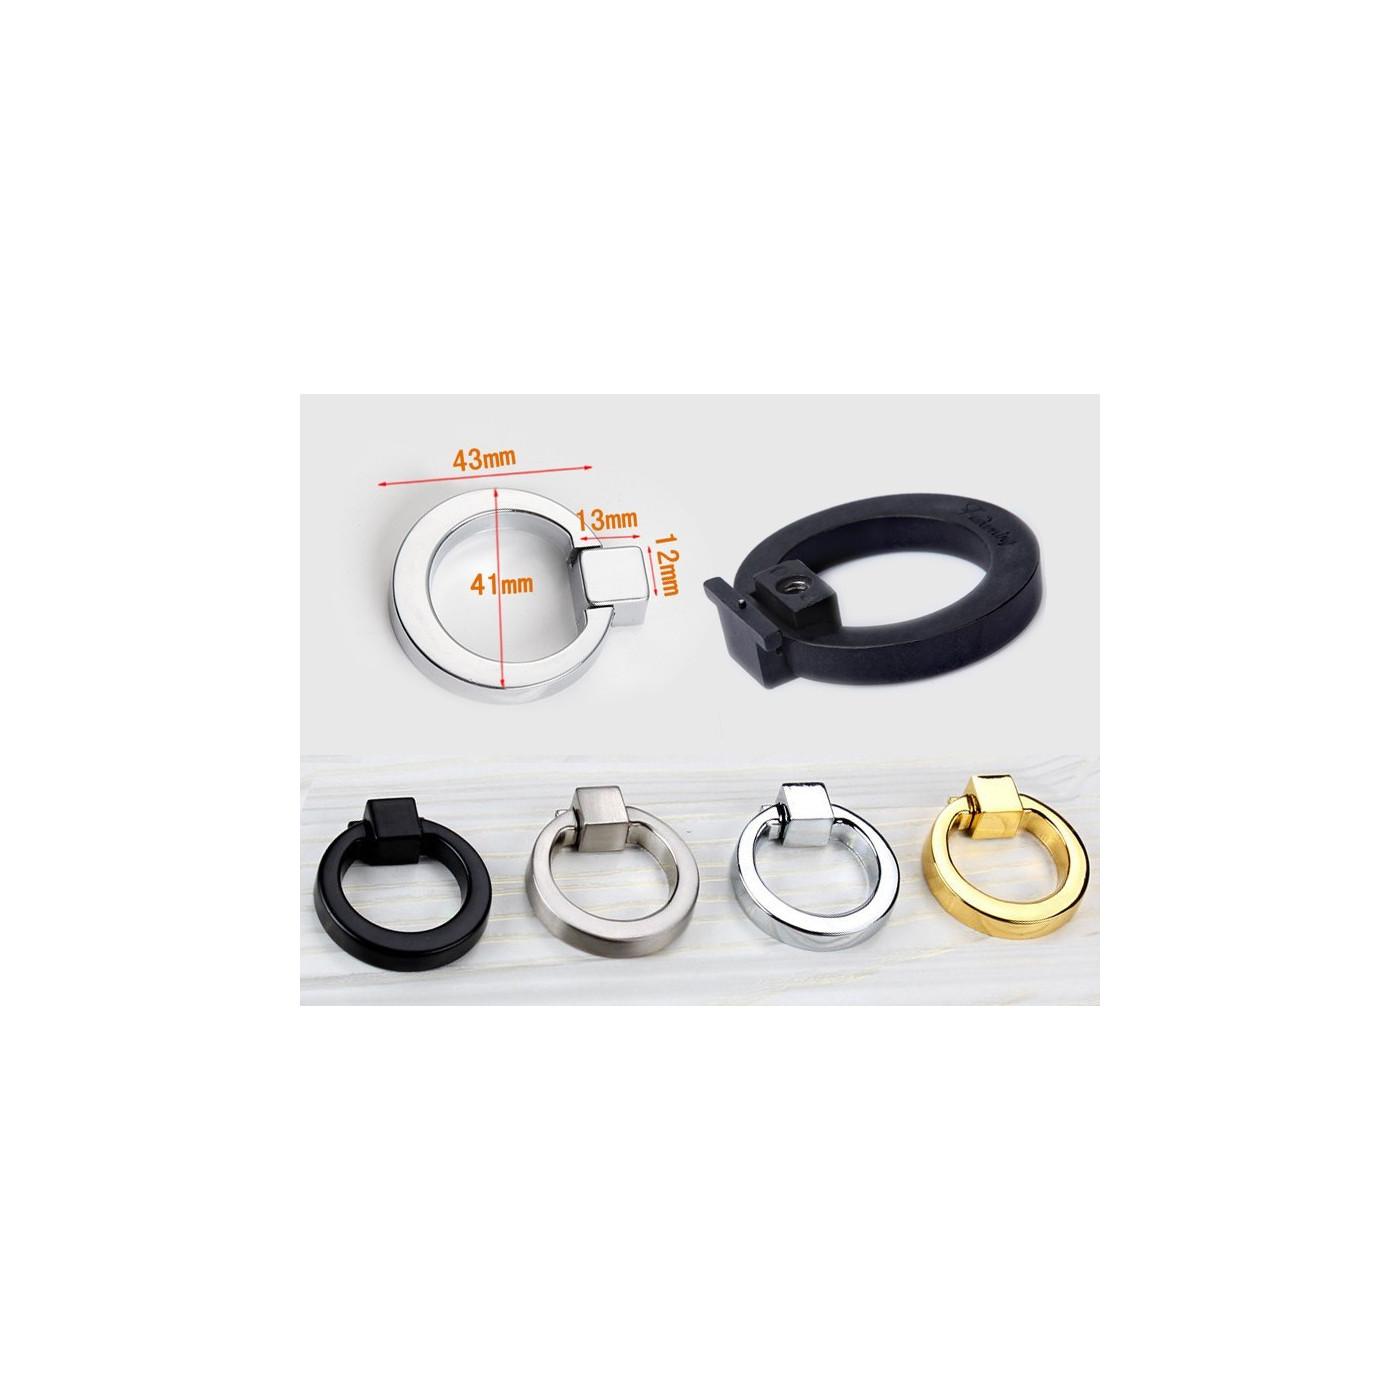 Set of 5 metal ring handles (chrome)  - 1